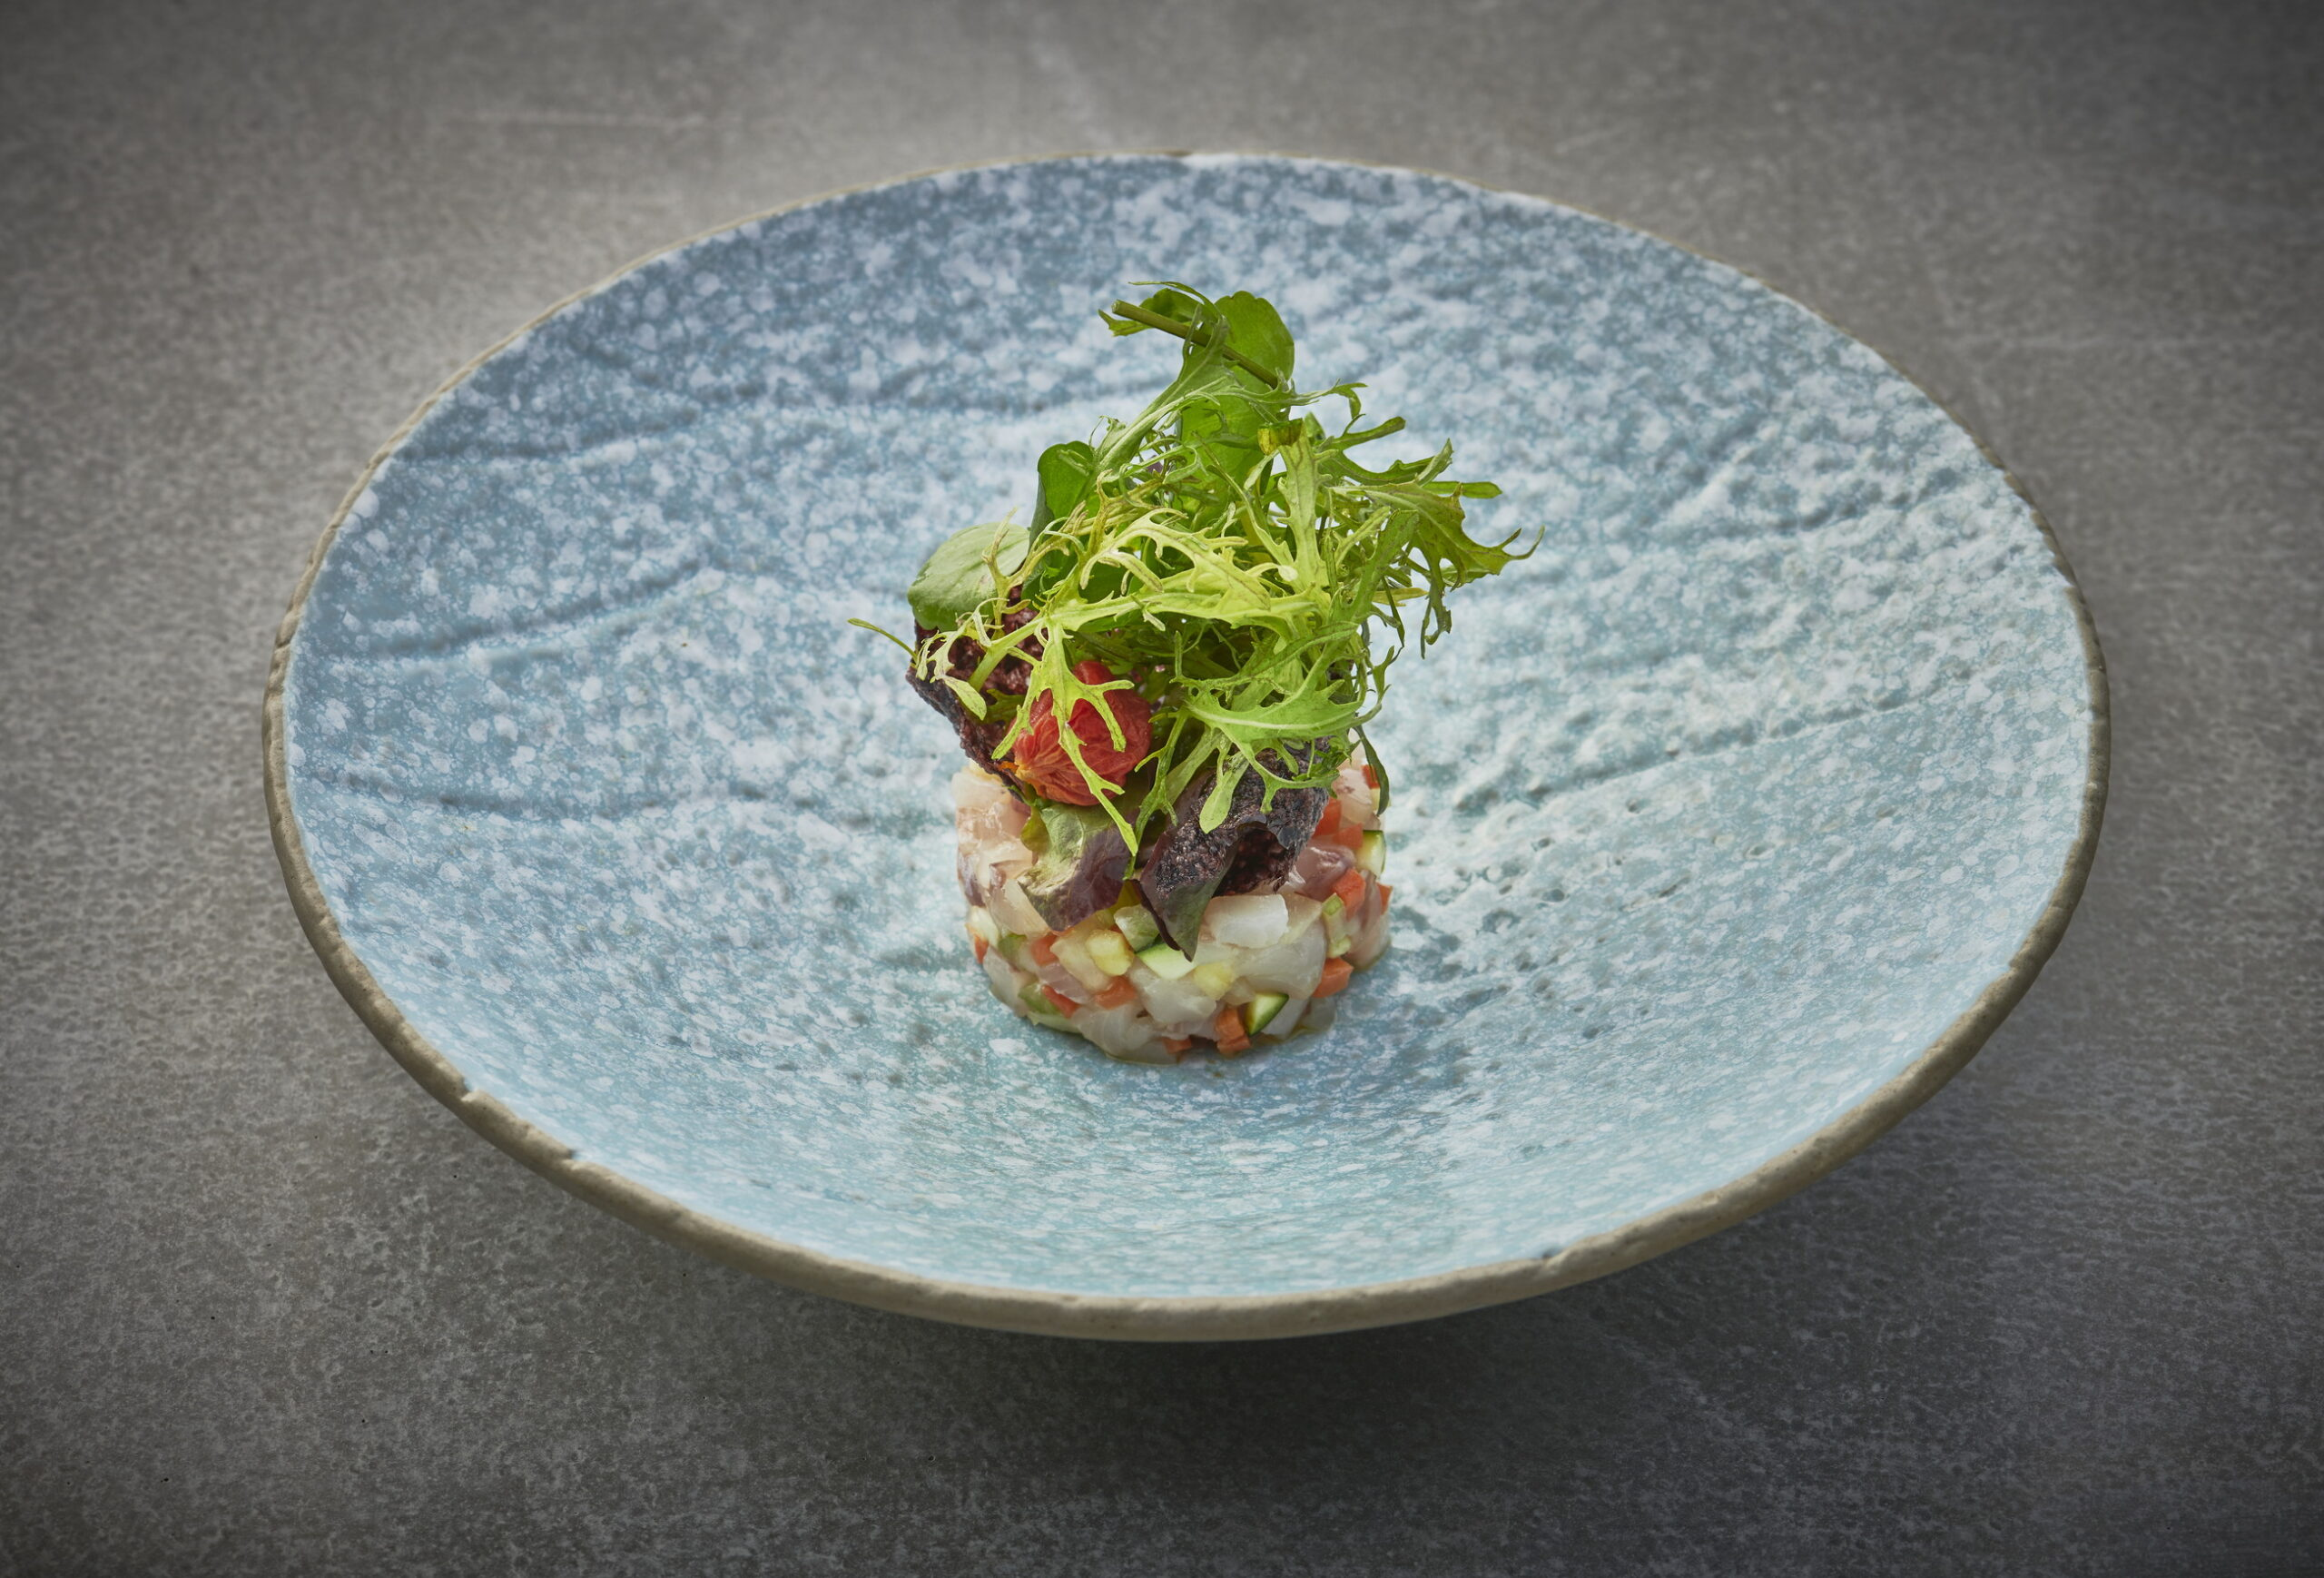 https://www.chialagunaresort.com/wp-content/uploads/2021/05/Hotel-Laguna_Bioaquam-Restaurant_Signature-Dish-scaled.jpg